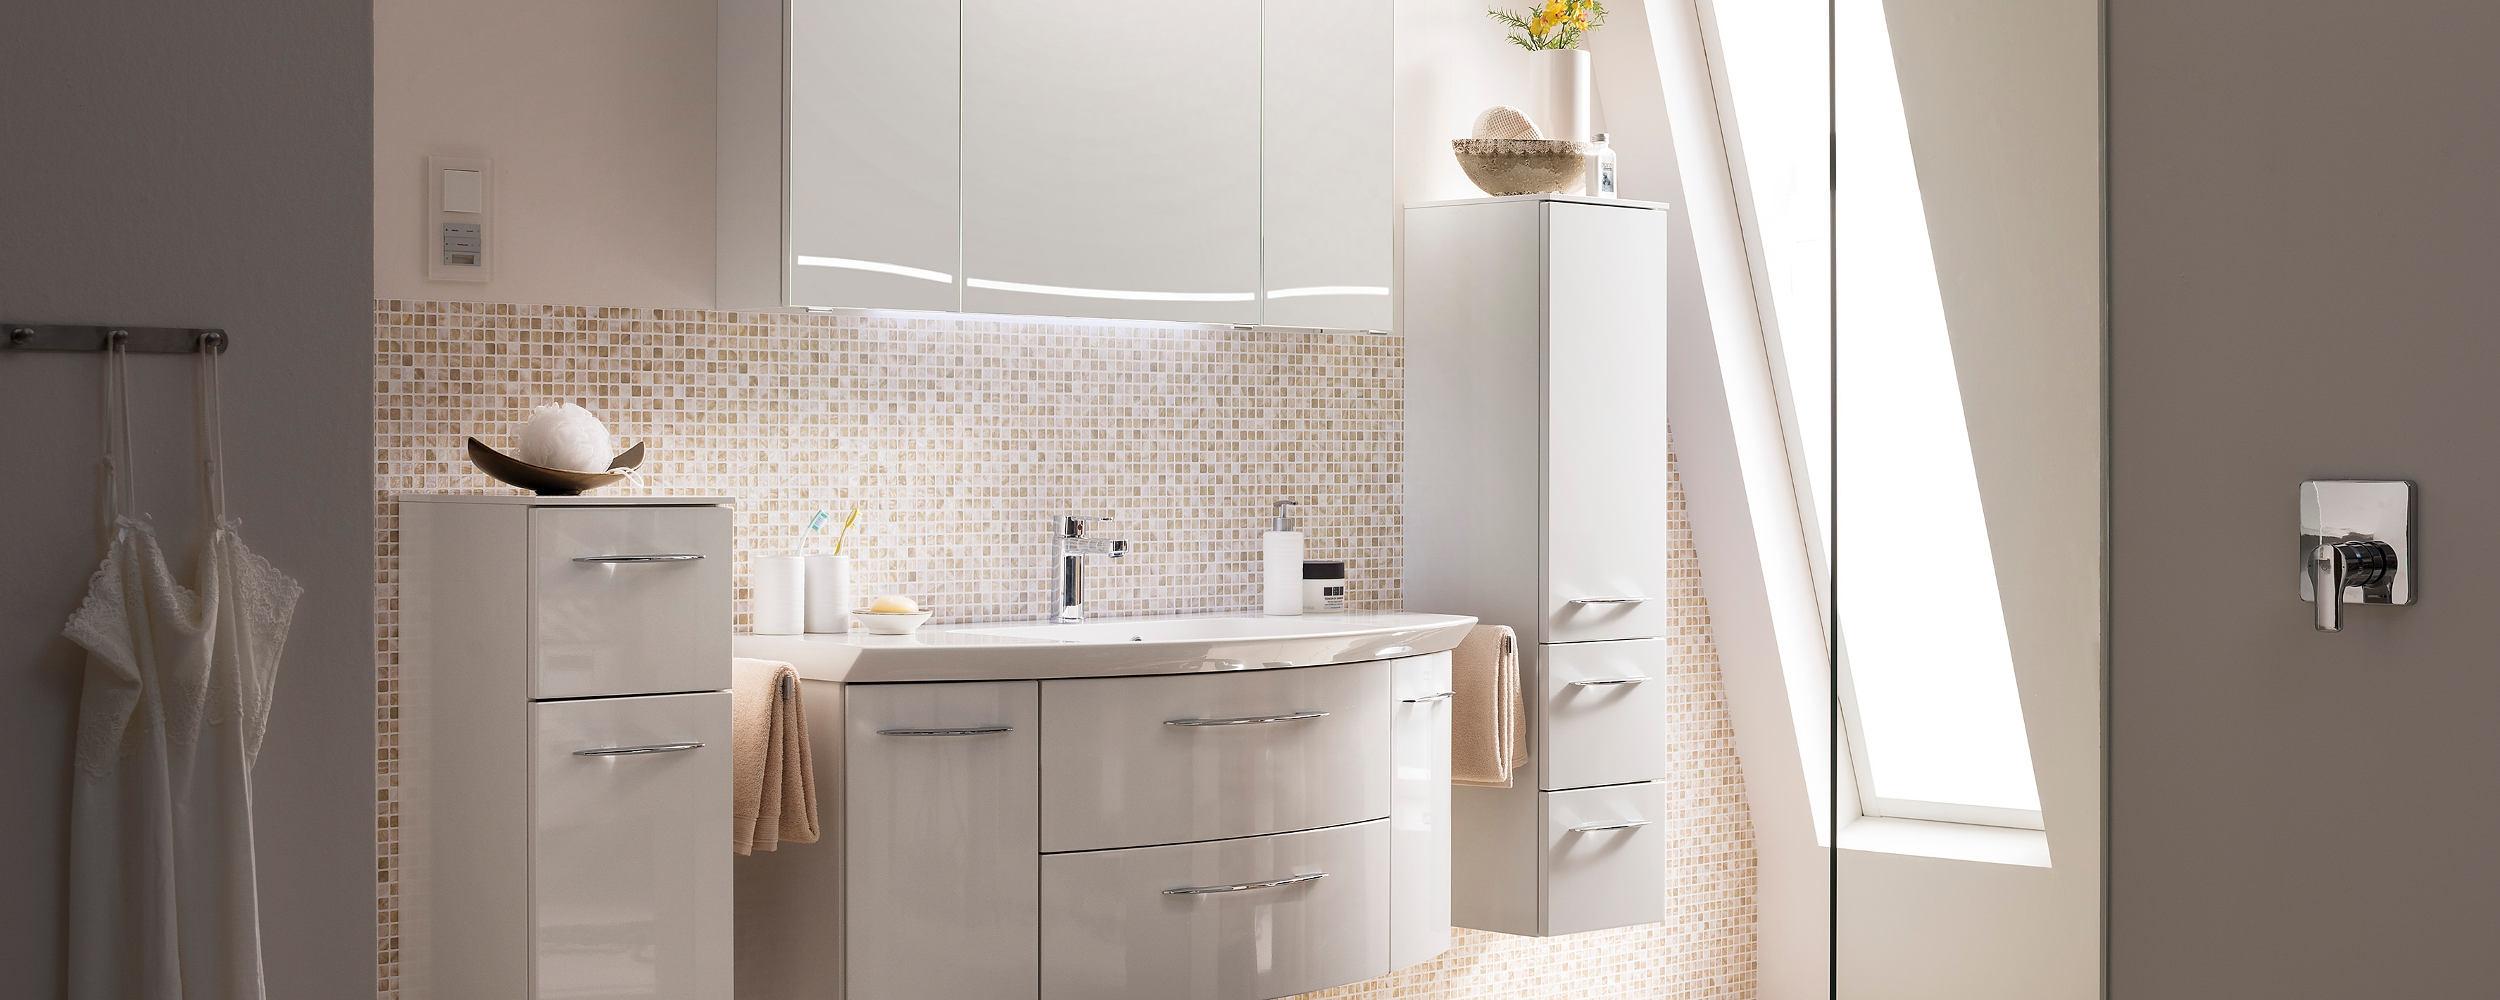 shower room edinburgh